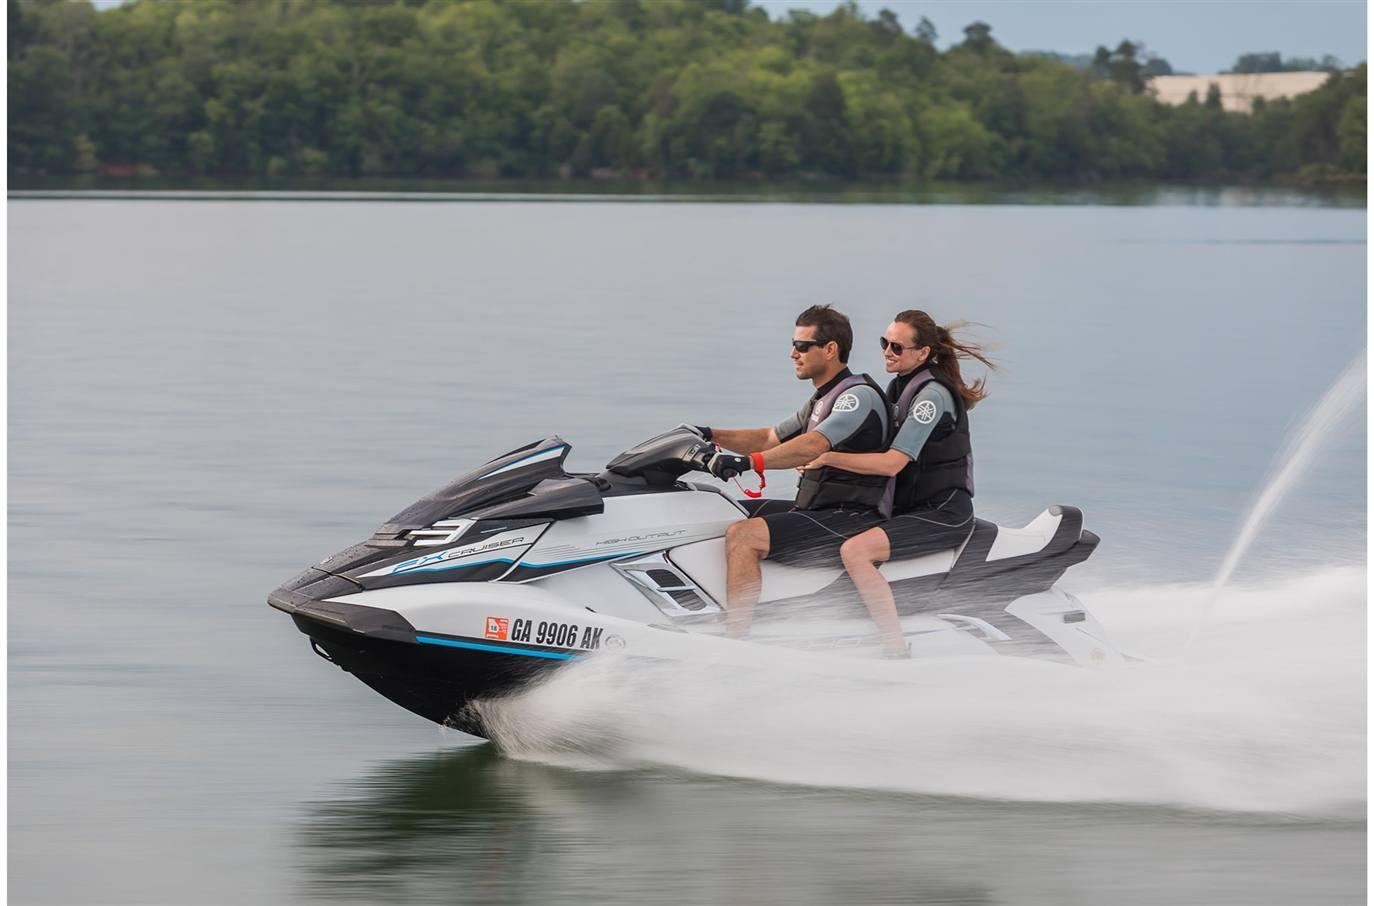 2018 Yamaha FX Cruiser HO for sale in Grand Bend, ON  Southwest